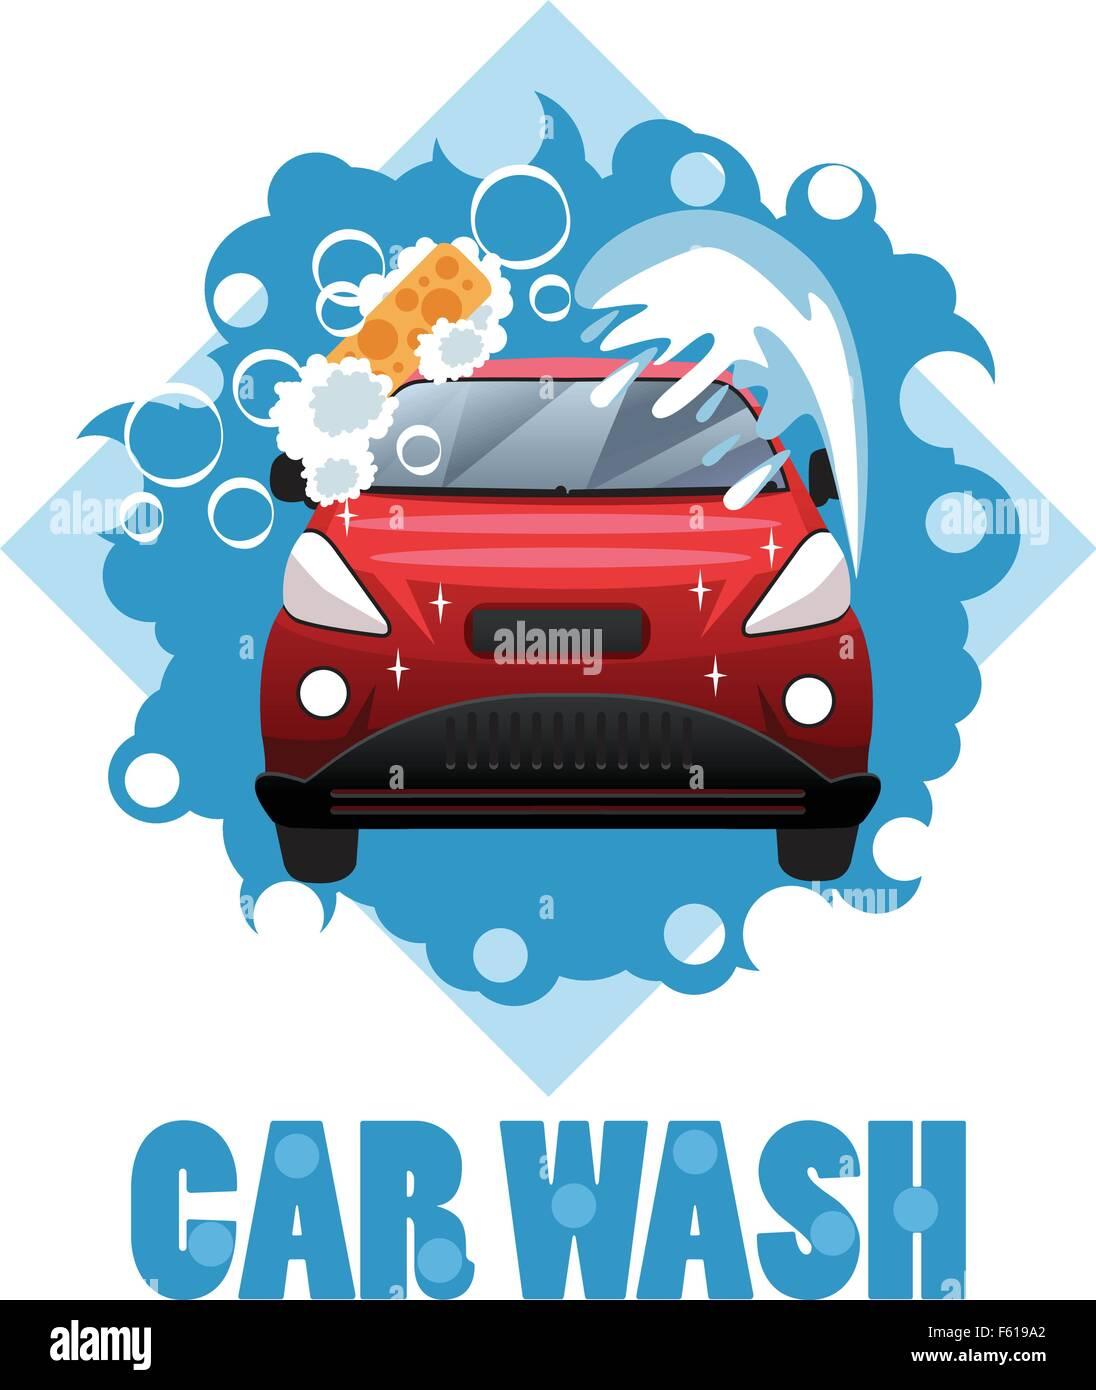 Car Wash Poster Stock Photos Car Wash Poster Stock Images Alamy